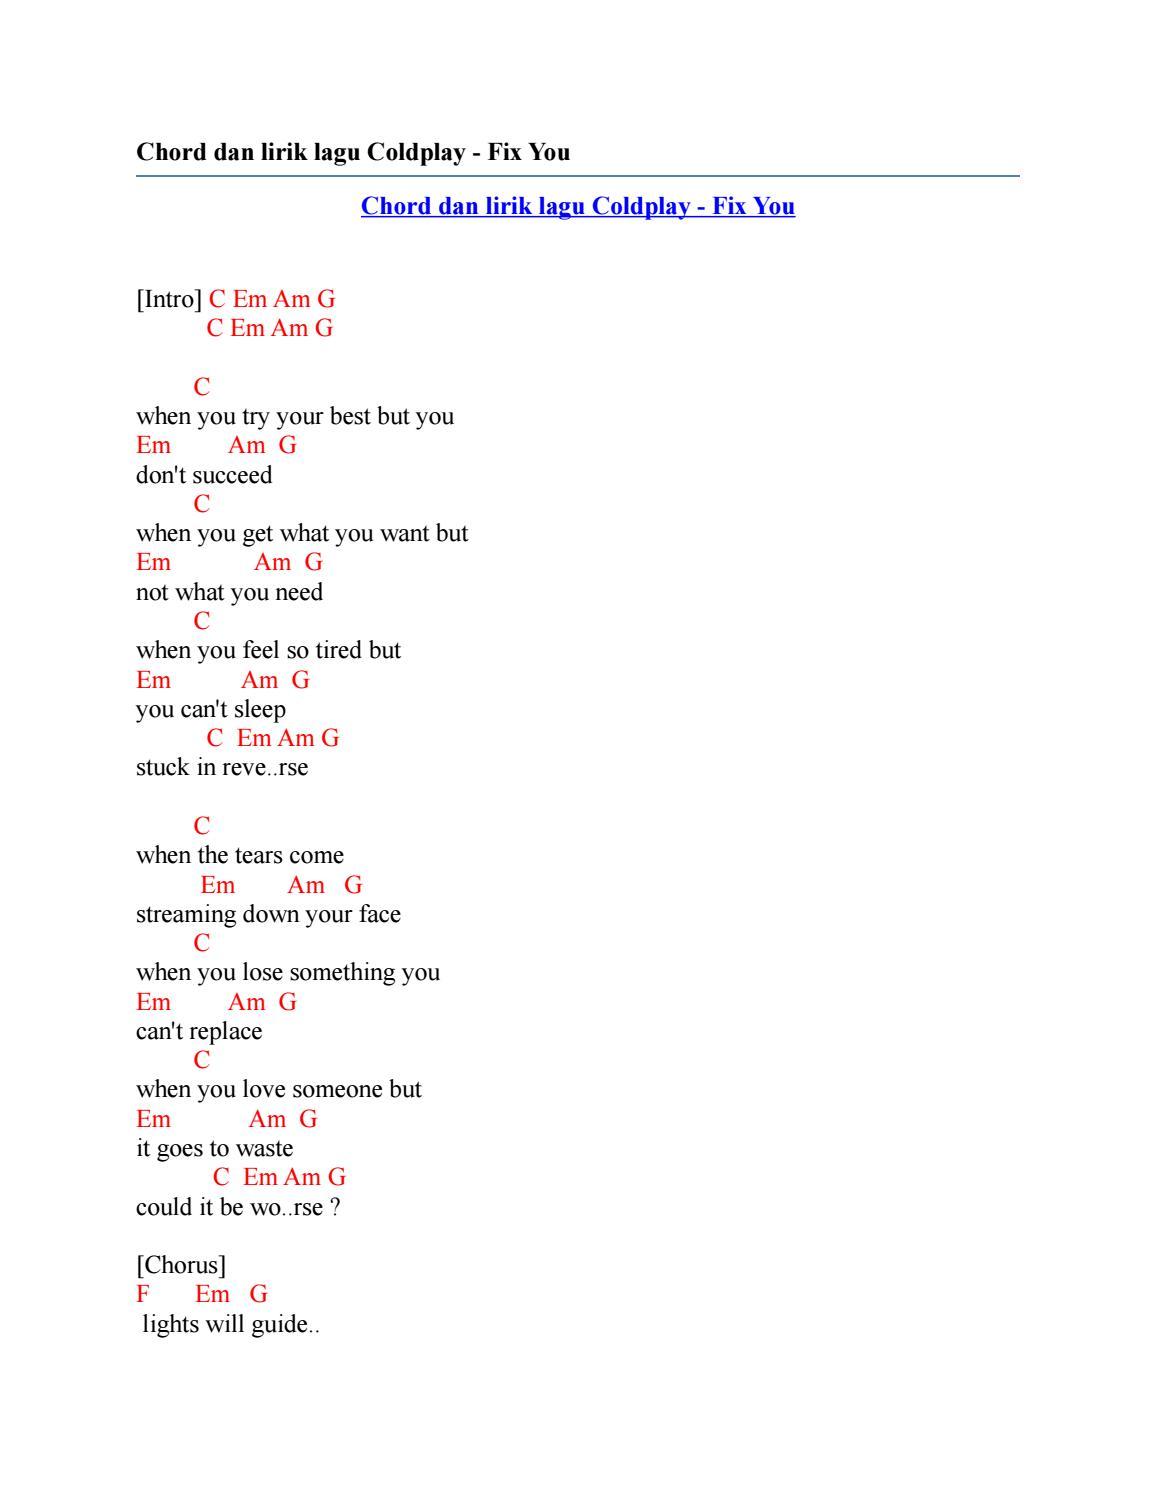 Coldplay: Lyrics: Viva La Vida